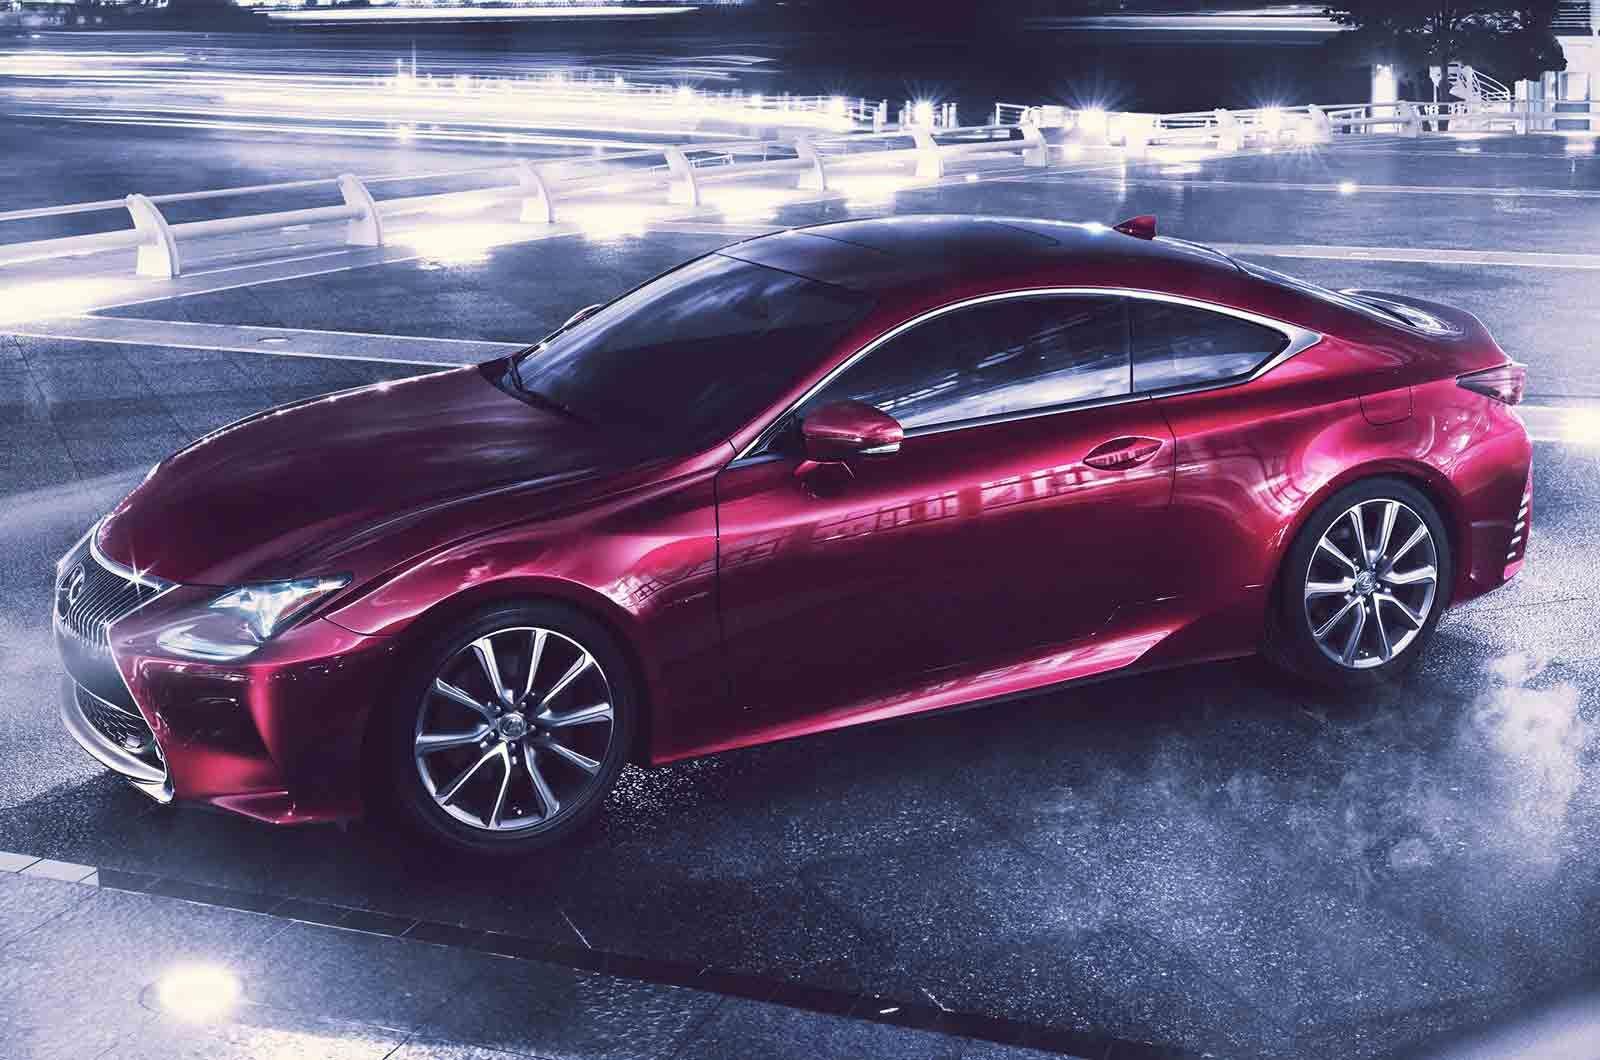 2013 11 04 Lexus RC 2 Auto's motoren, Modelauto en Motor